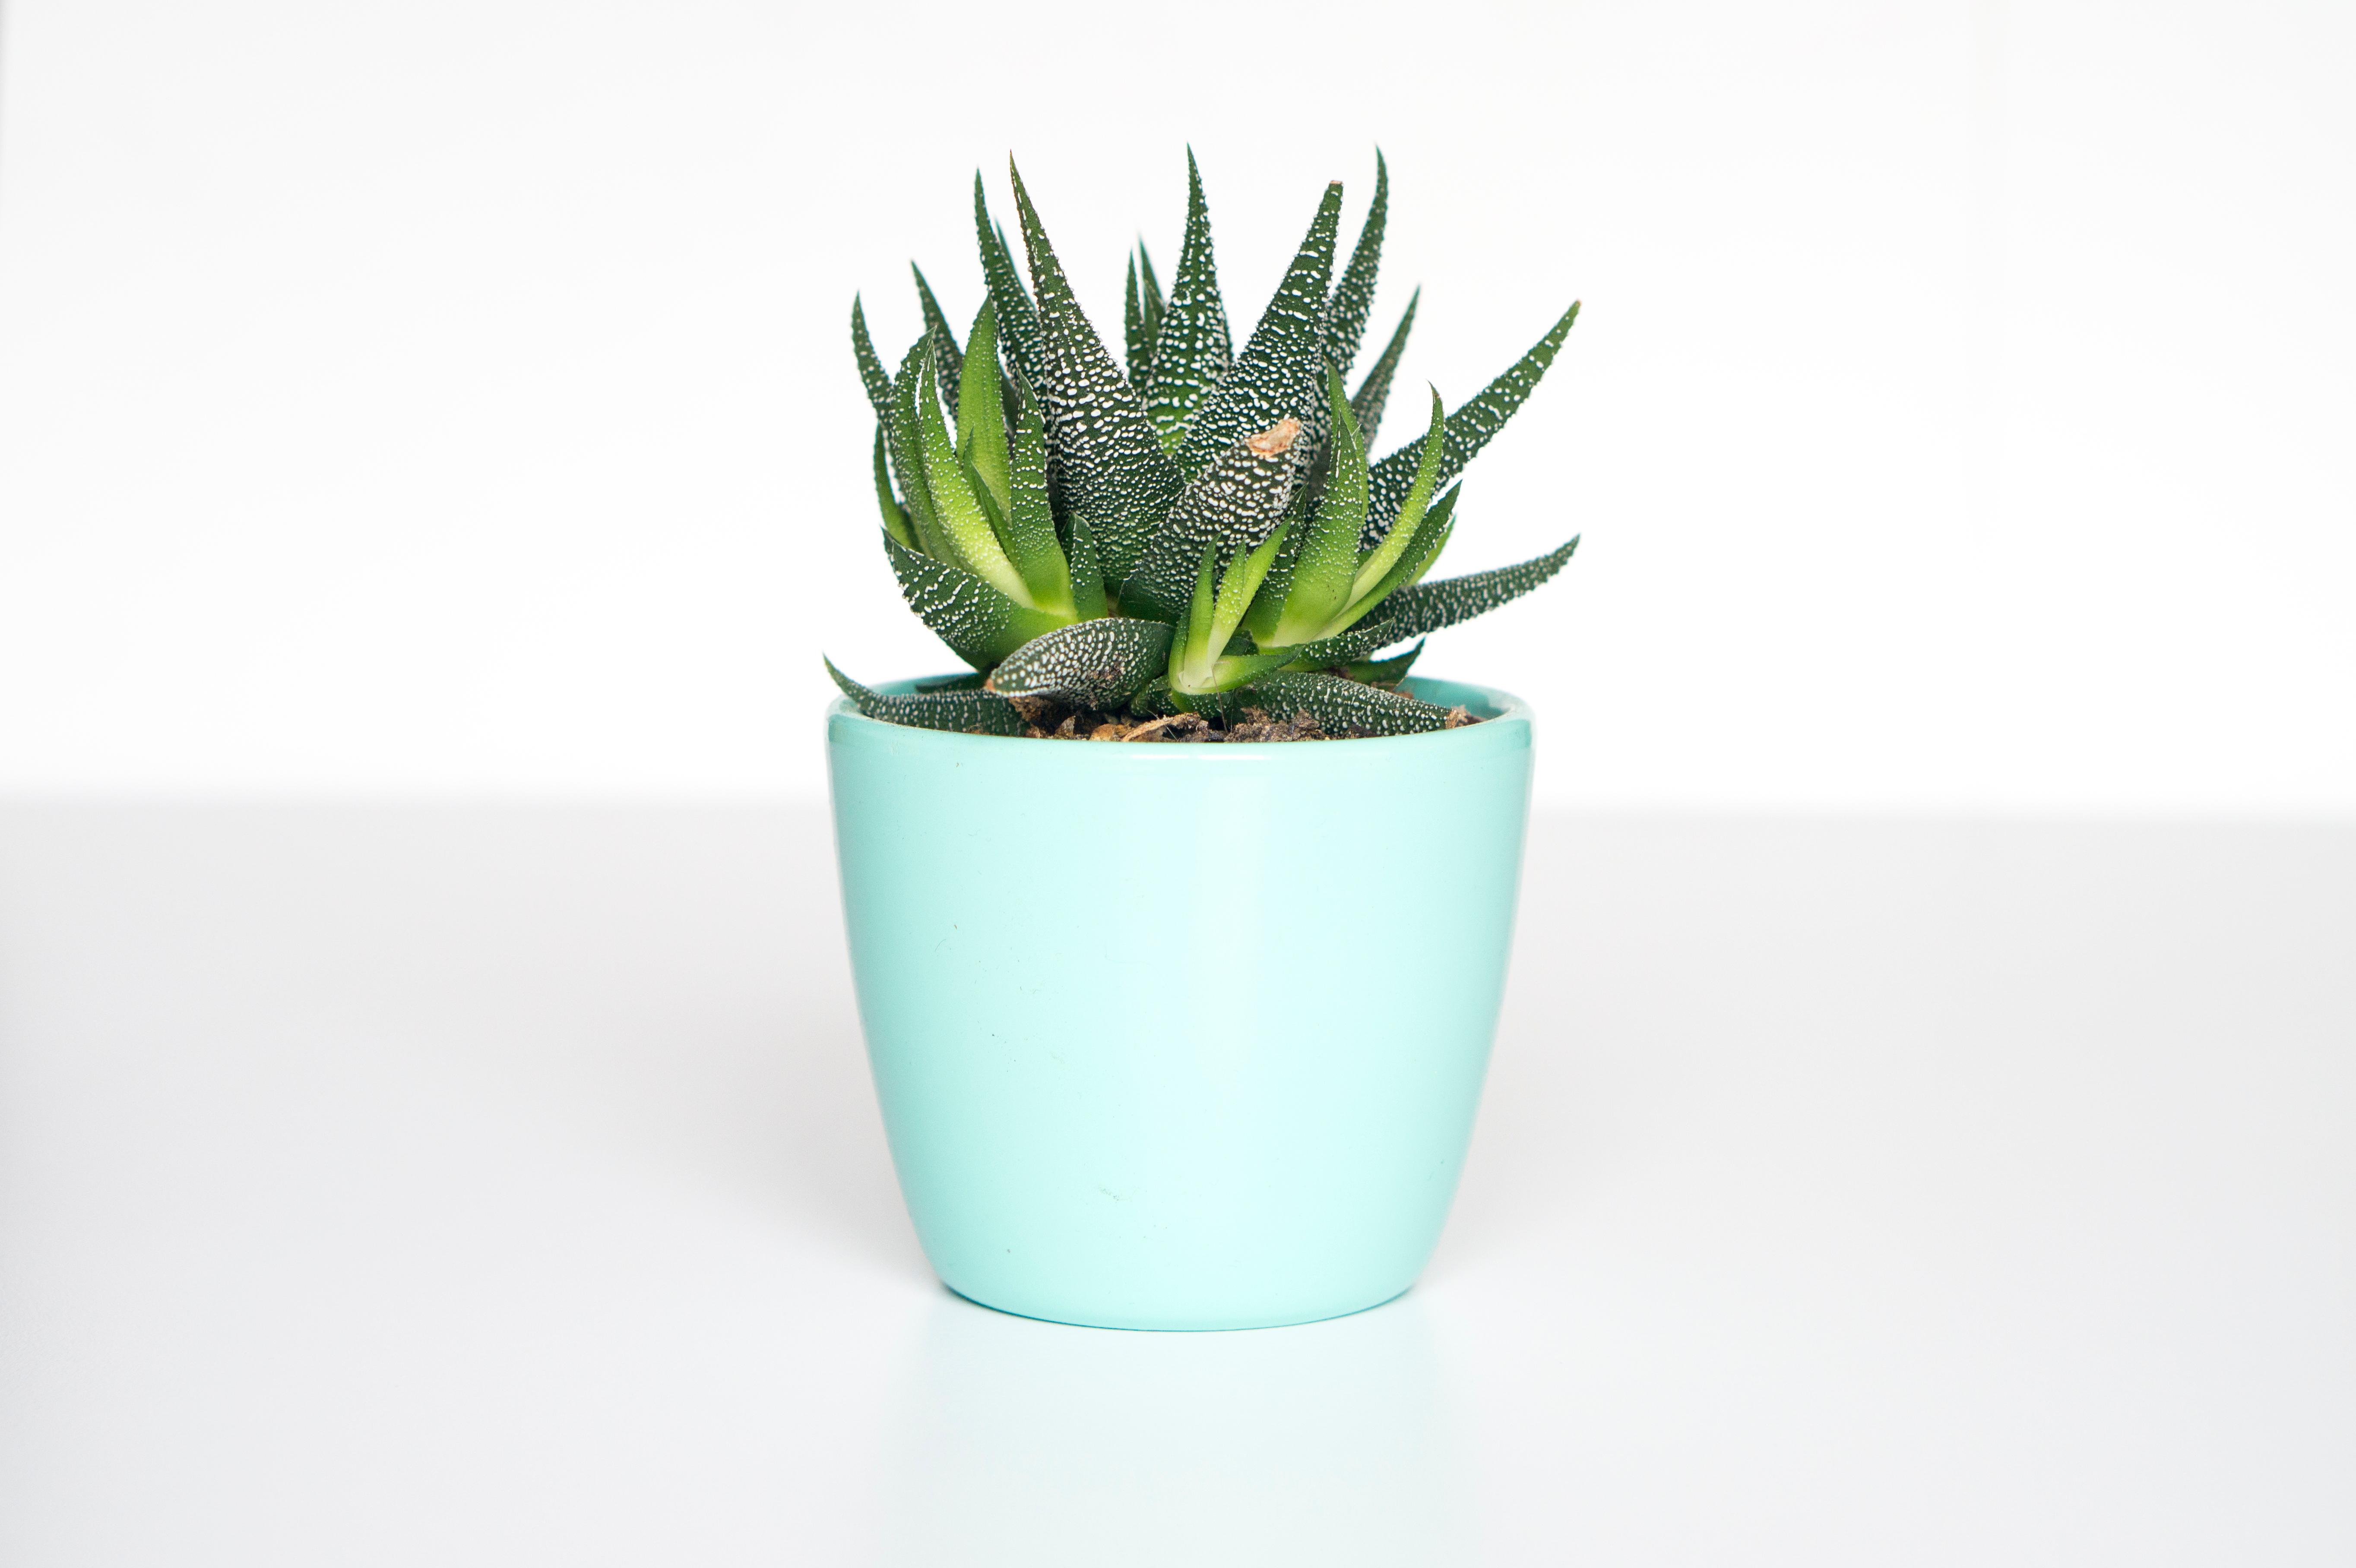 Aloe Vera ayuda a decorar tu hogar